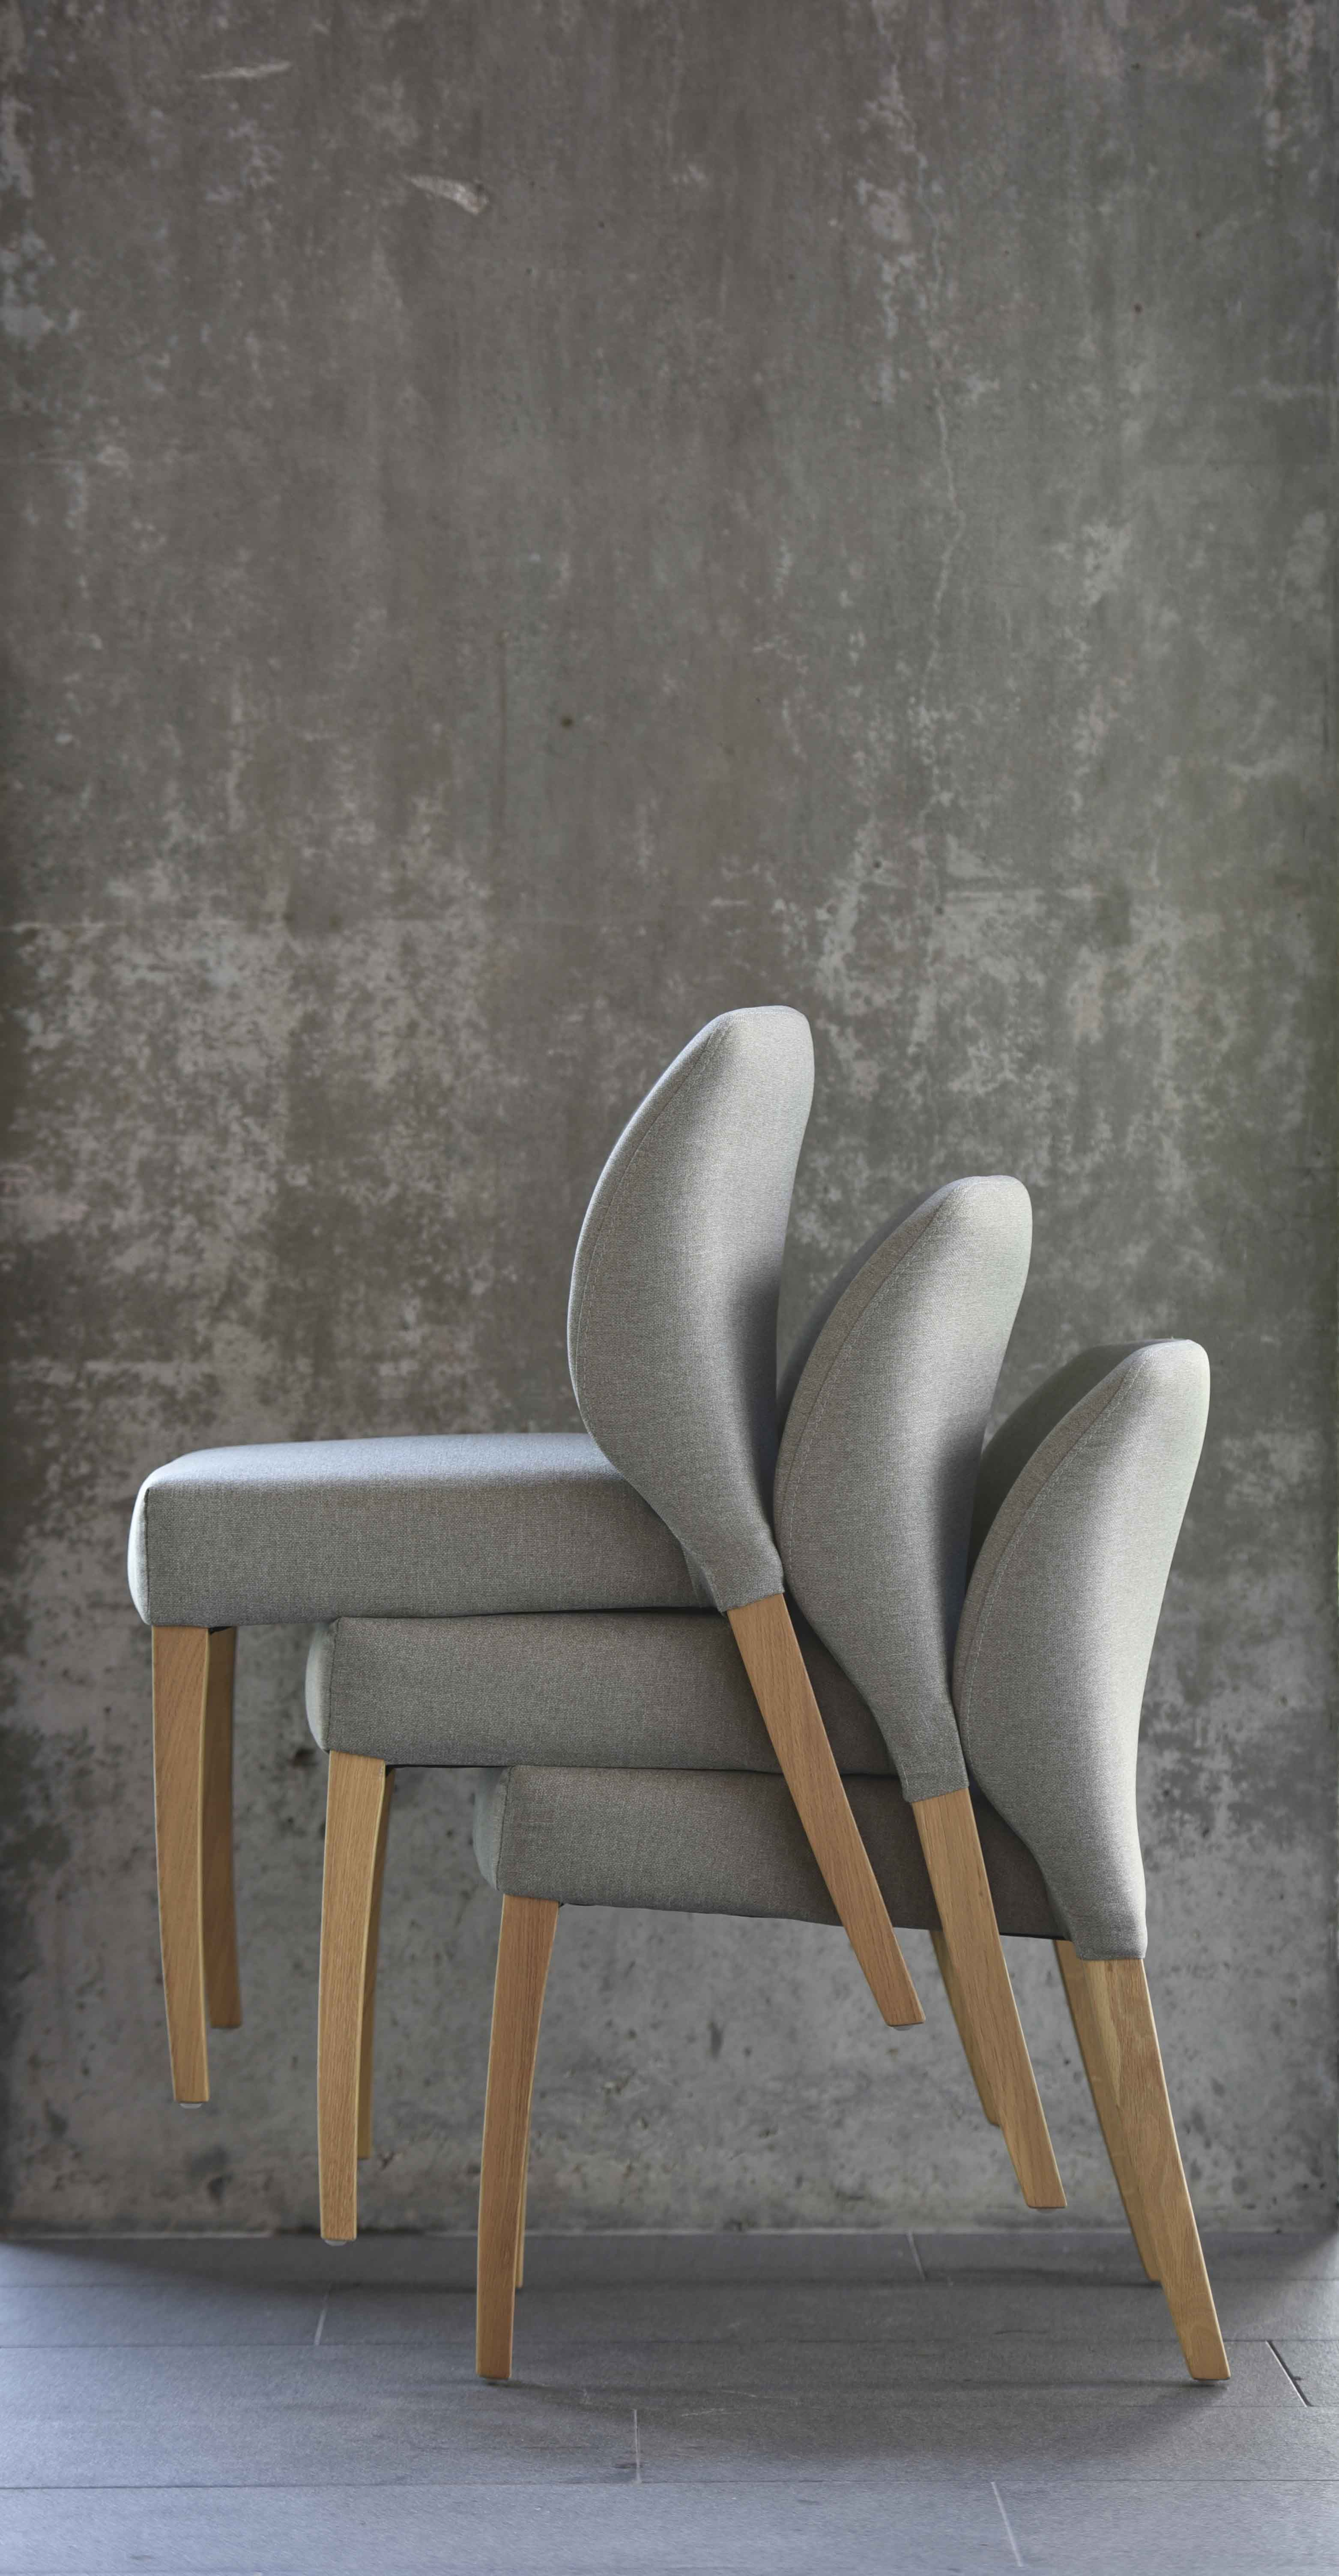 Blow Chair By Kian Furniture Design By Enrique Mart  # Muebles Lifestyle